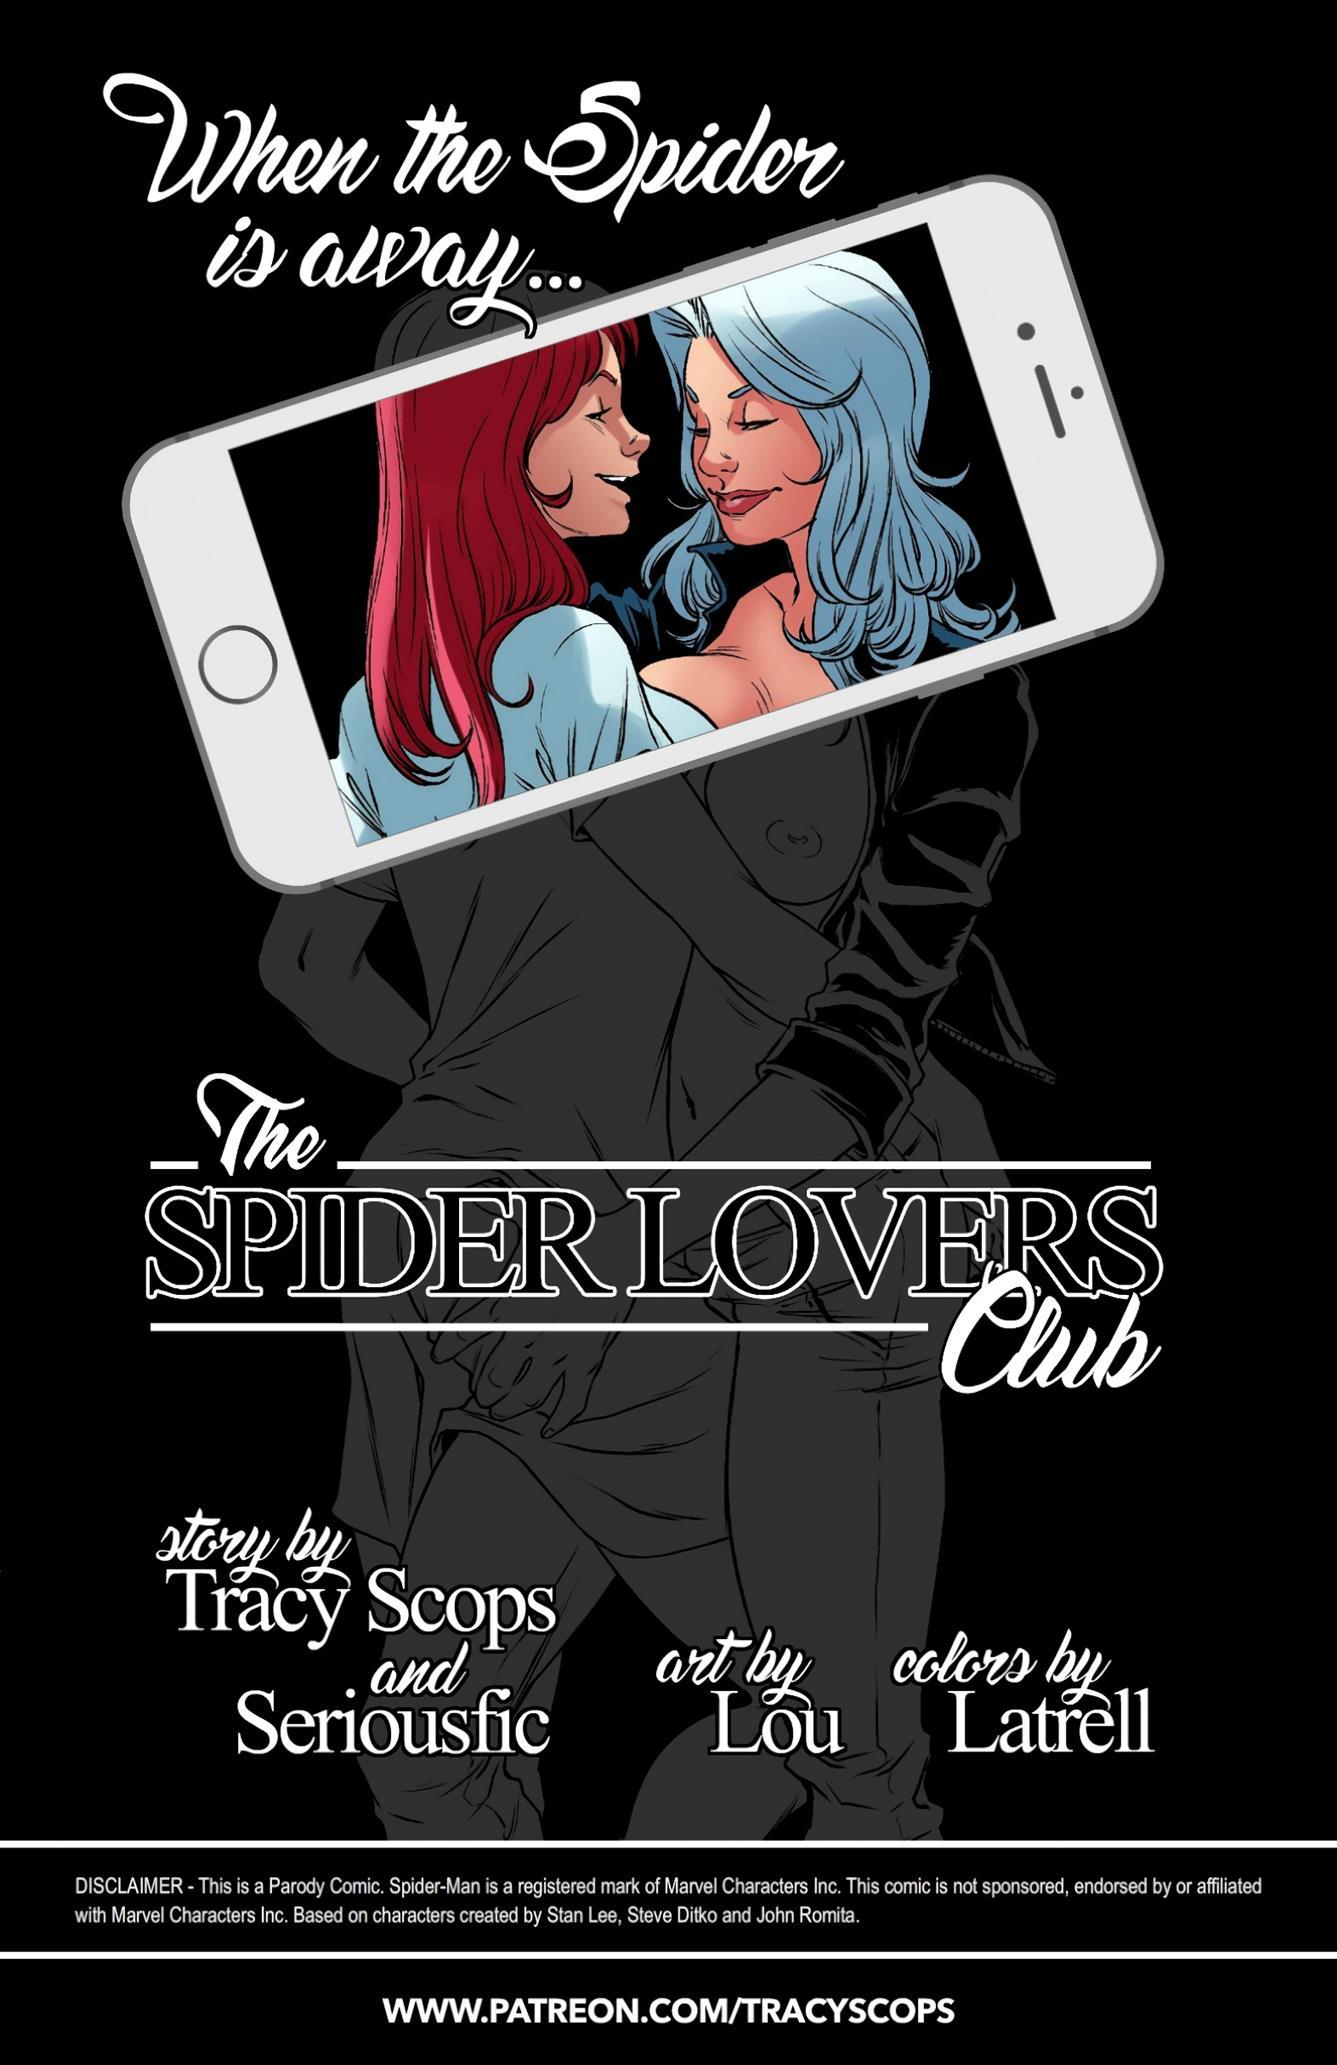 SPIDER LOVERS CLUB (Spider-man) [TracyScops] - Foto 2